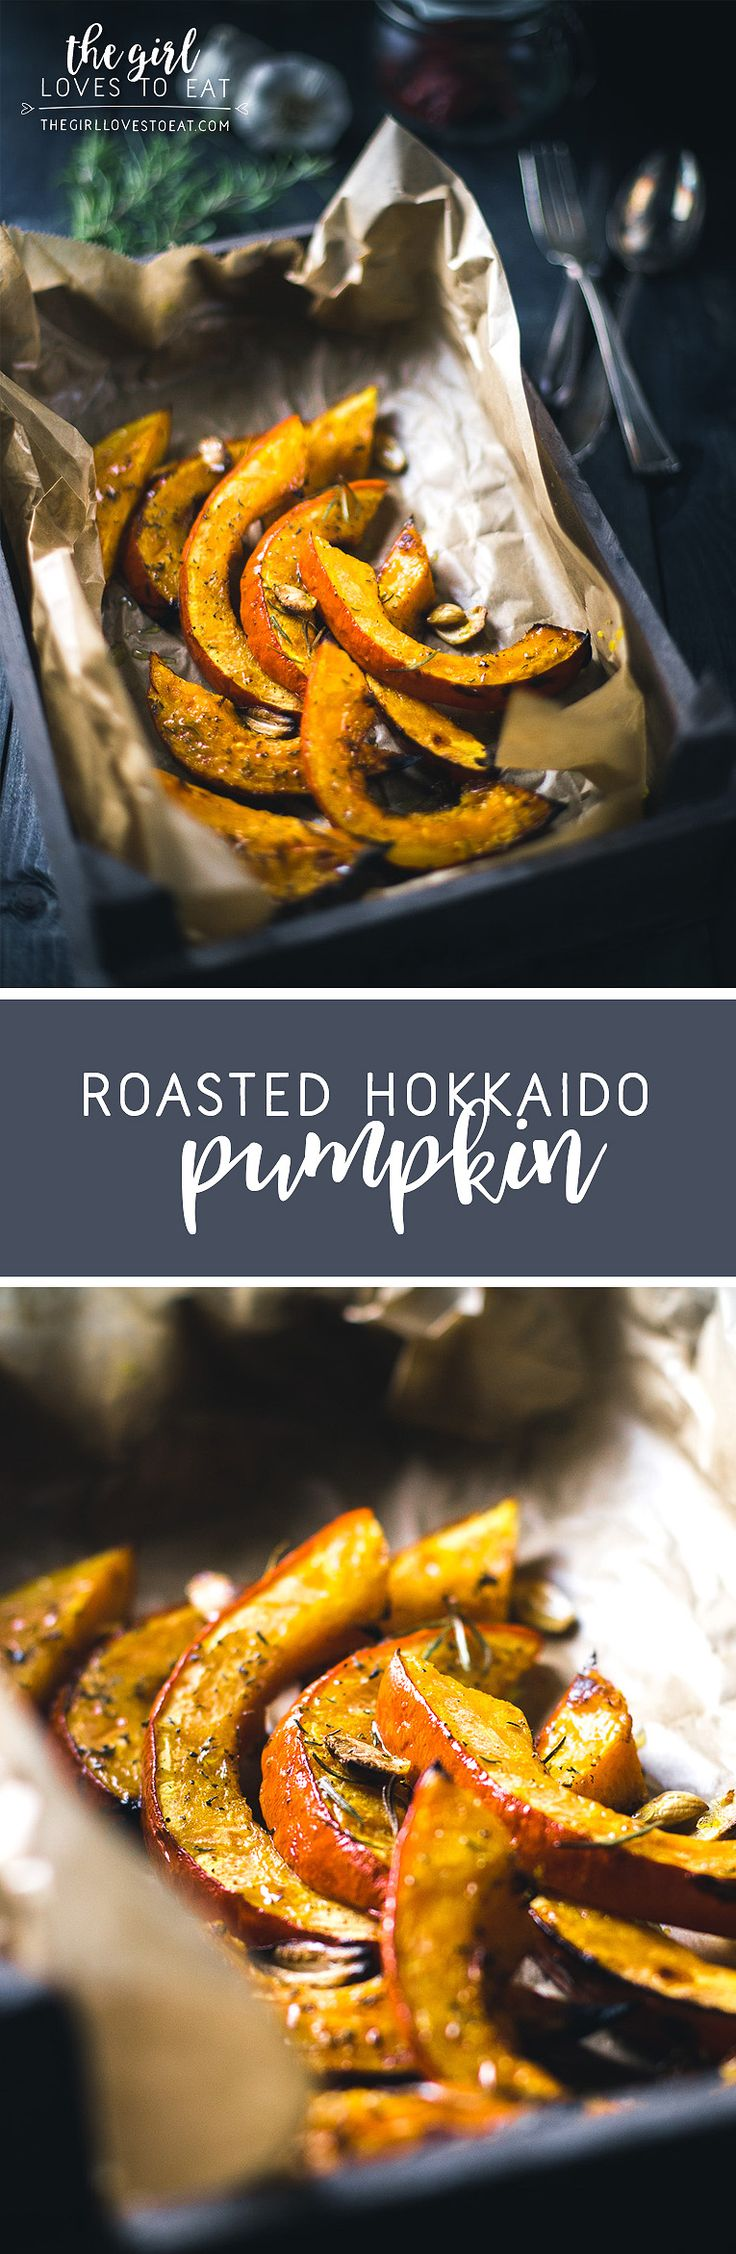 Roasted Hokkaido Pumpkin { thegirllovestoeat.com }